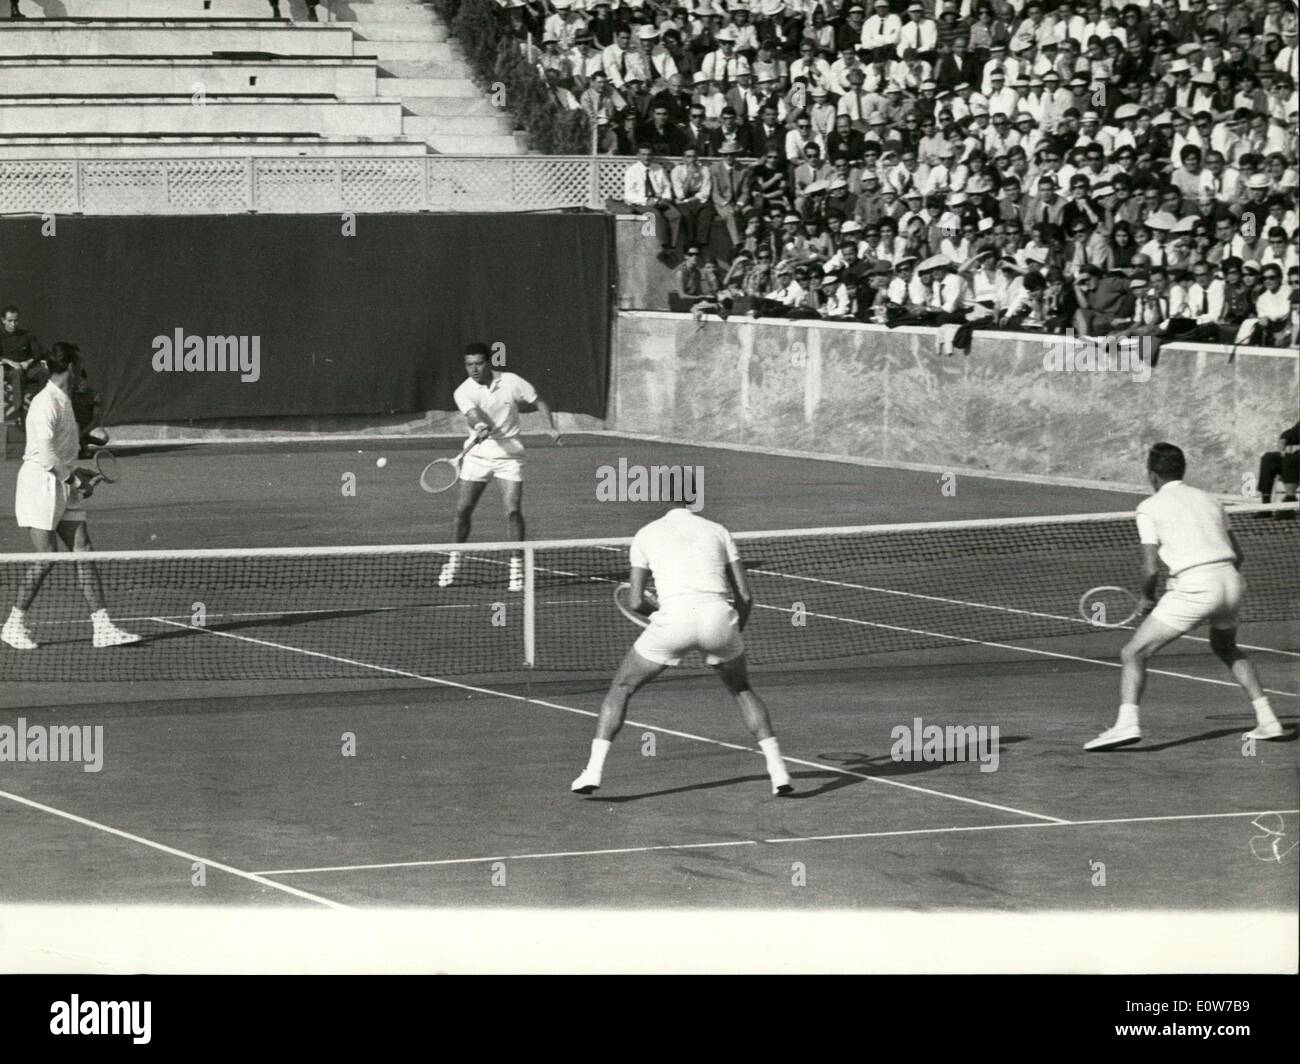 Oct 15 1961 Rome Davis Cup Interzone Finals Italy = U S A